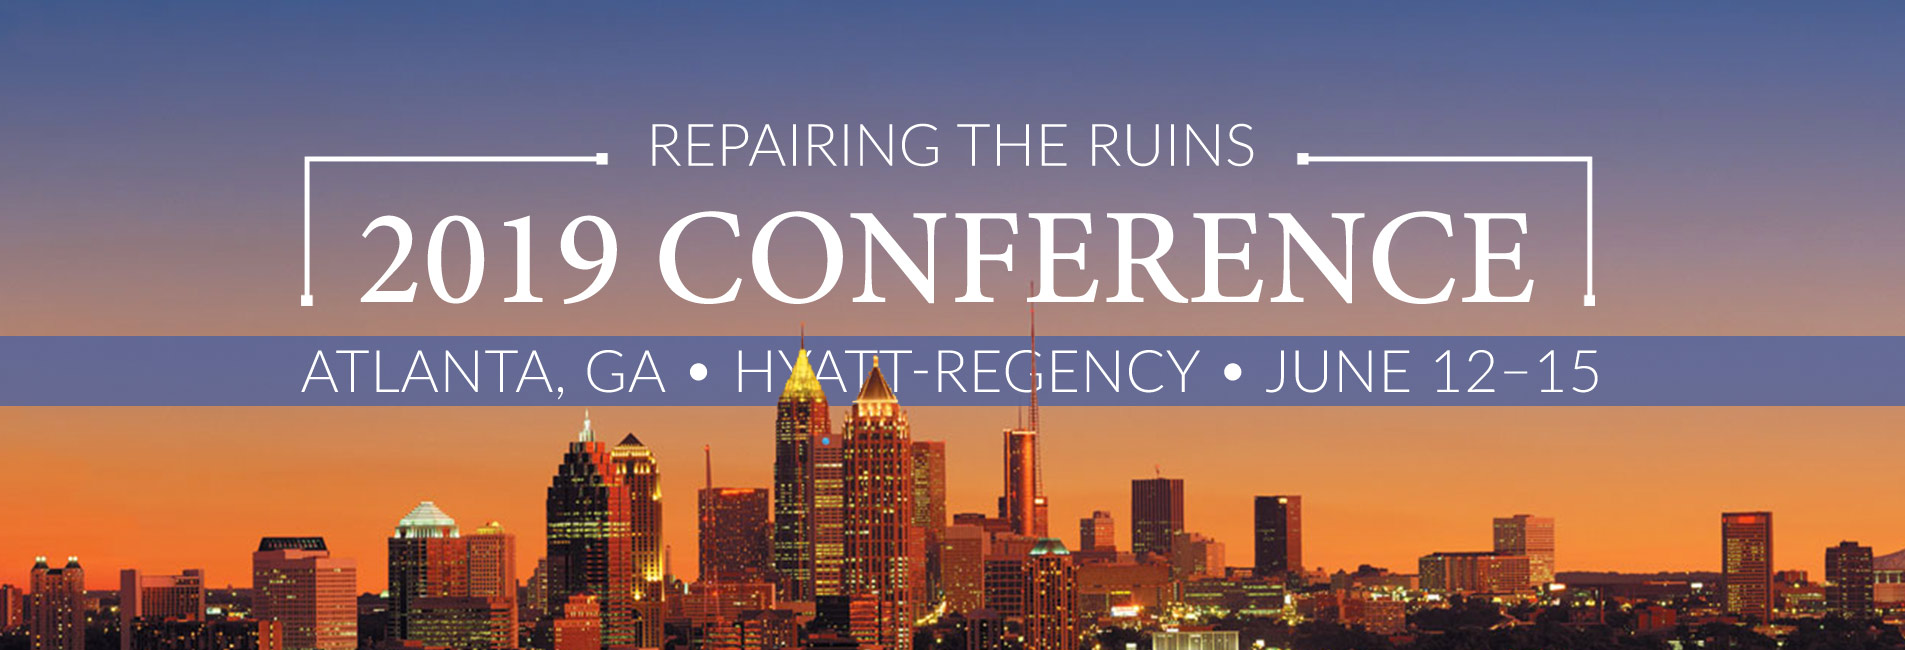 Repairing the Ruins conference 2019 ACCS Atlanta classical Christian education